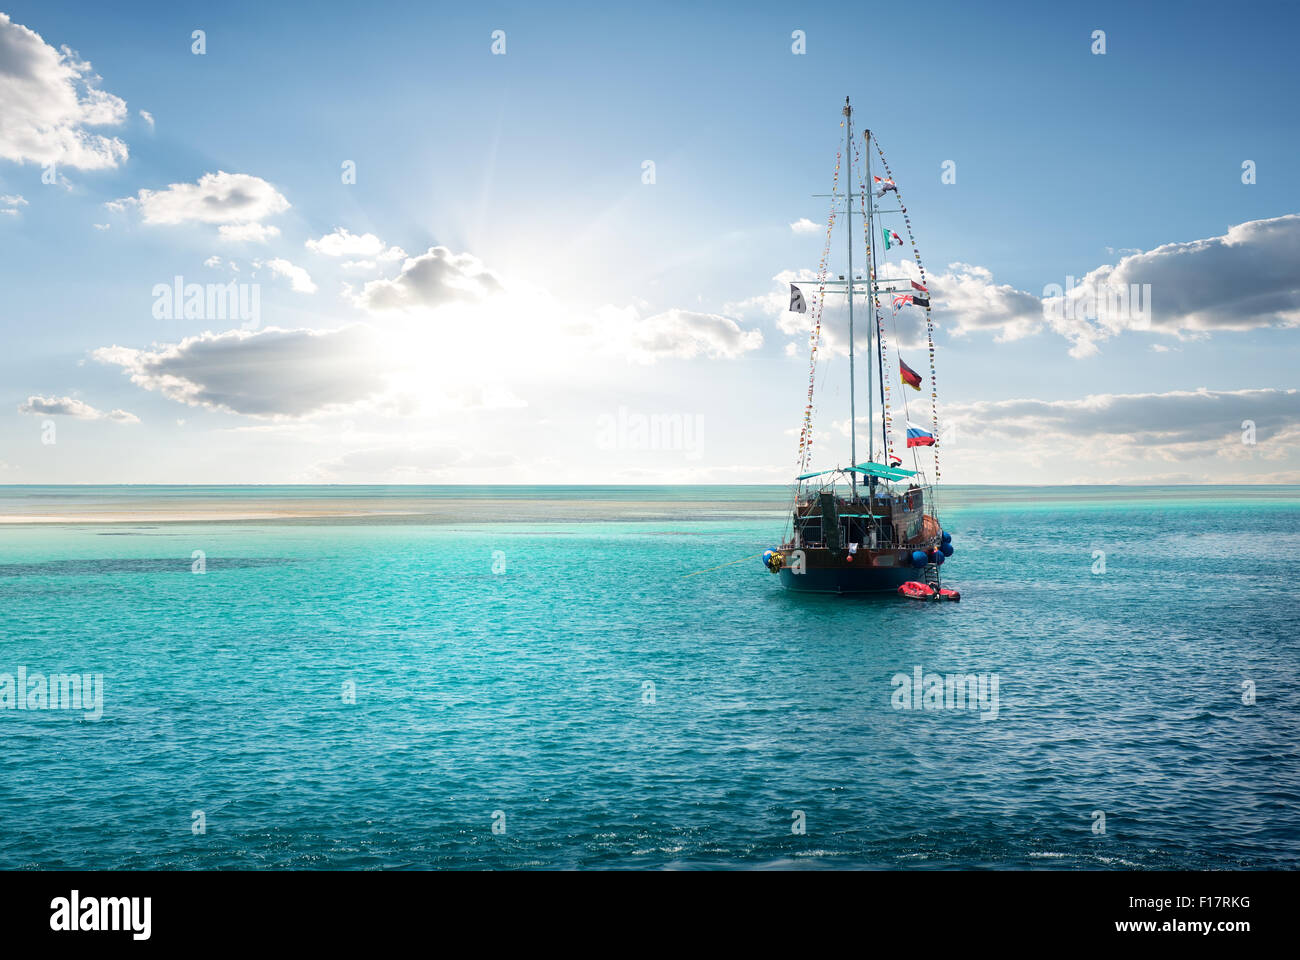 Yacht im Meer nahe der Insel bei Sonnenaufgang Stockbild